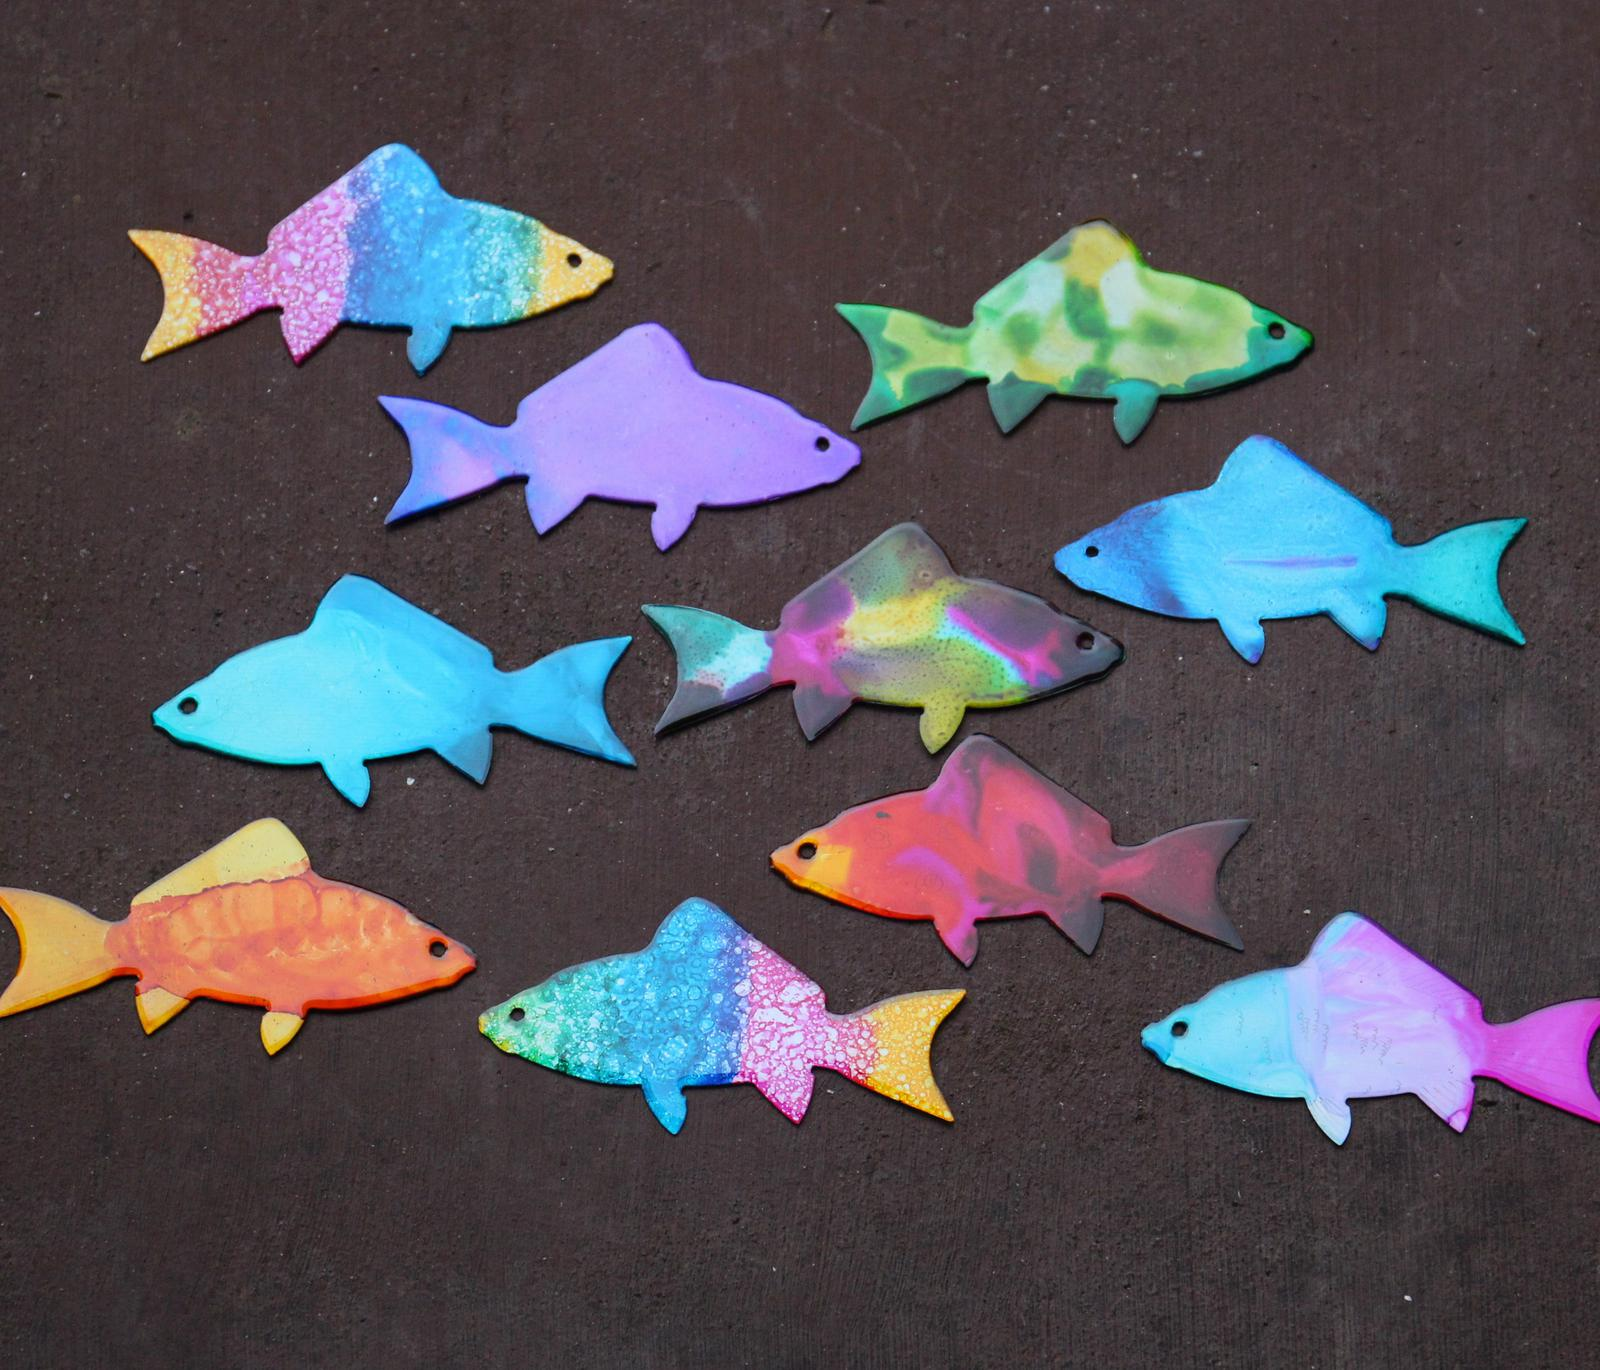 Galaxia Metal fish